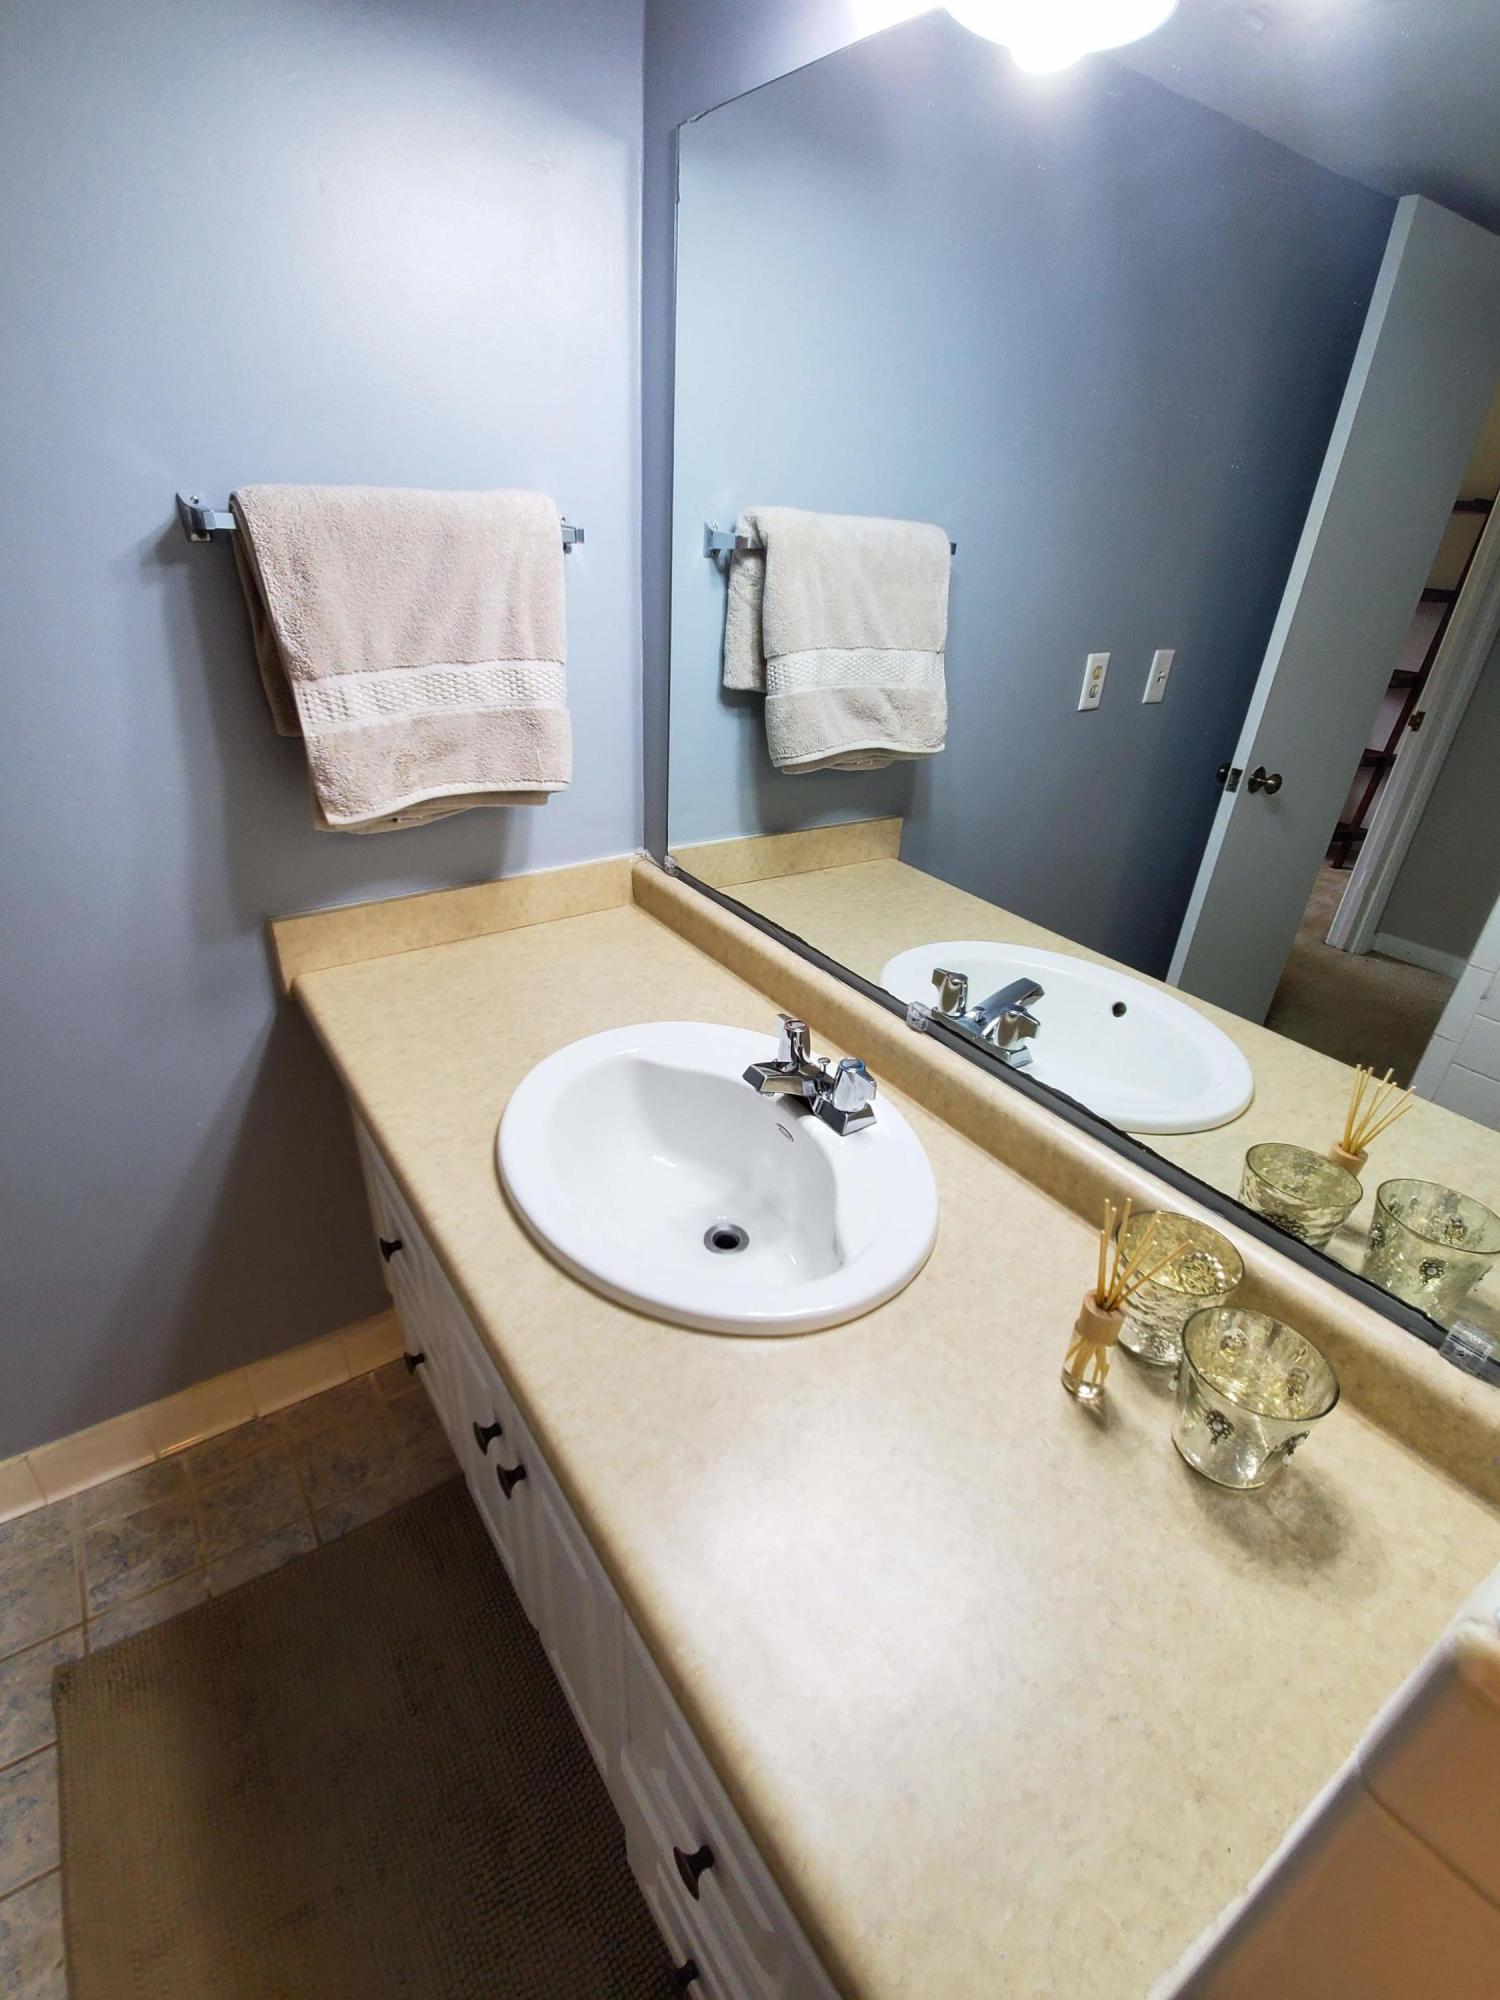 Snee Farm Homes For Sale - 105 Ventura, Mount Pleasant, SC - 36